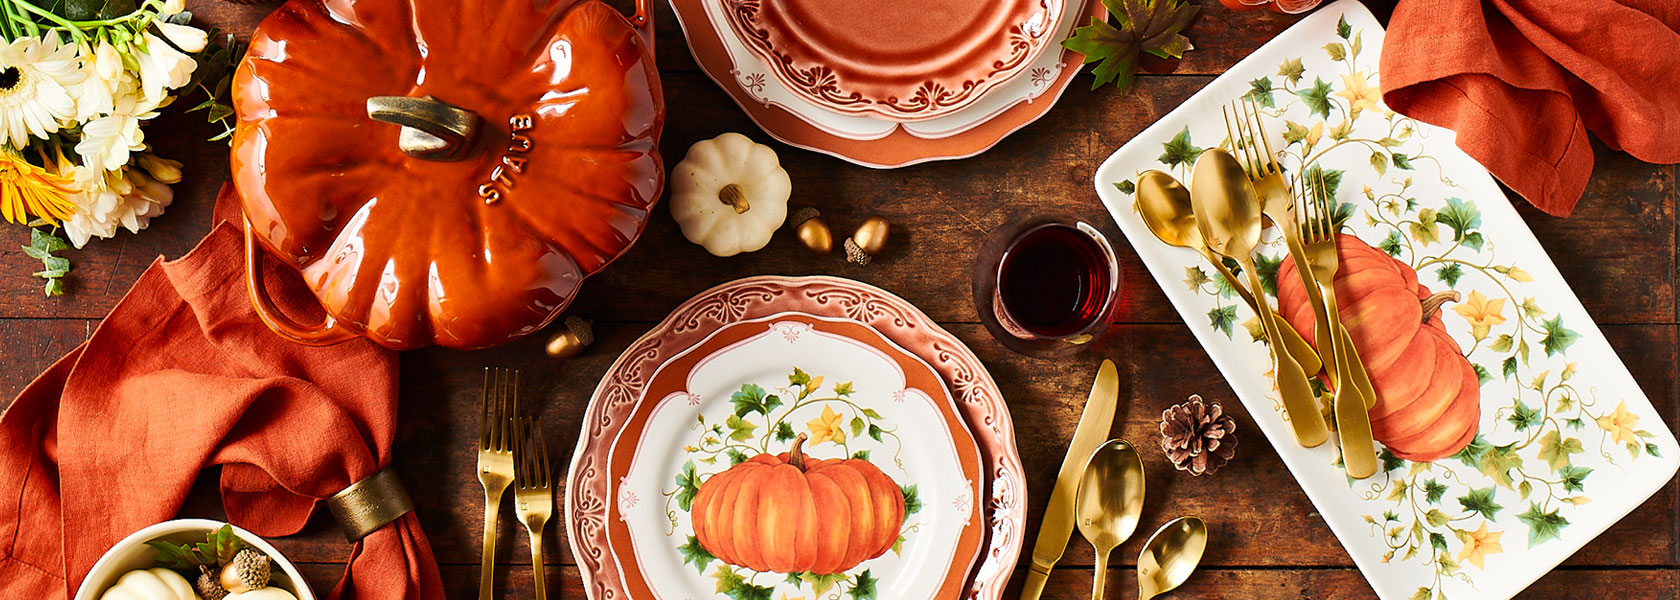 Staub pumpkin cocotte and pumpkin dinnerware